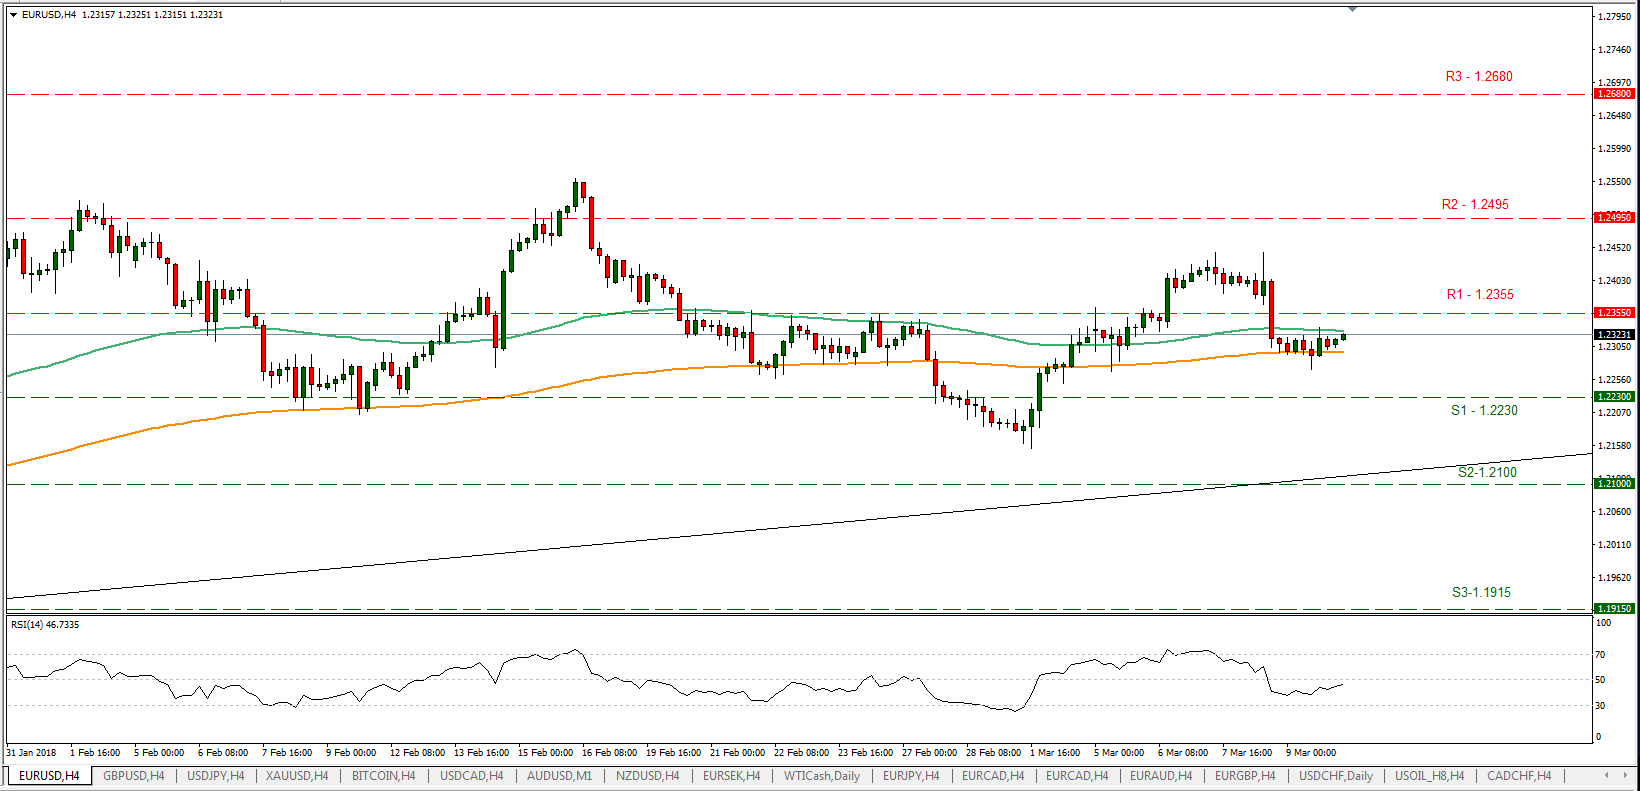 EUR/USD 12/03/2018 | EconAlerts